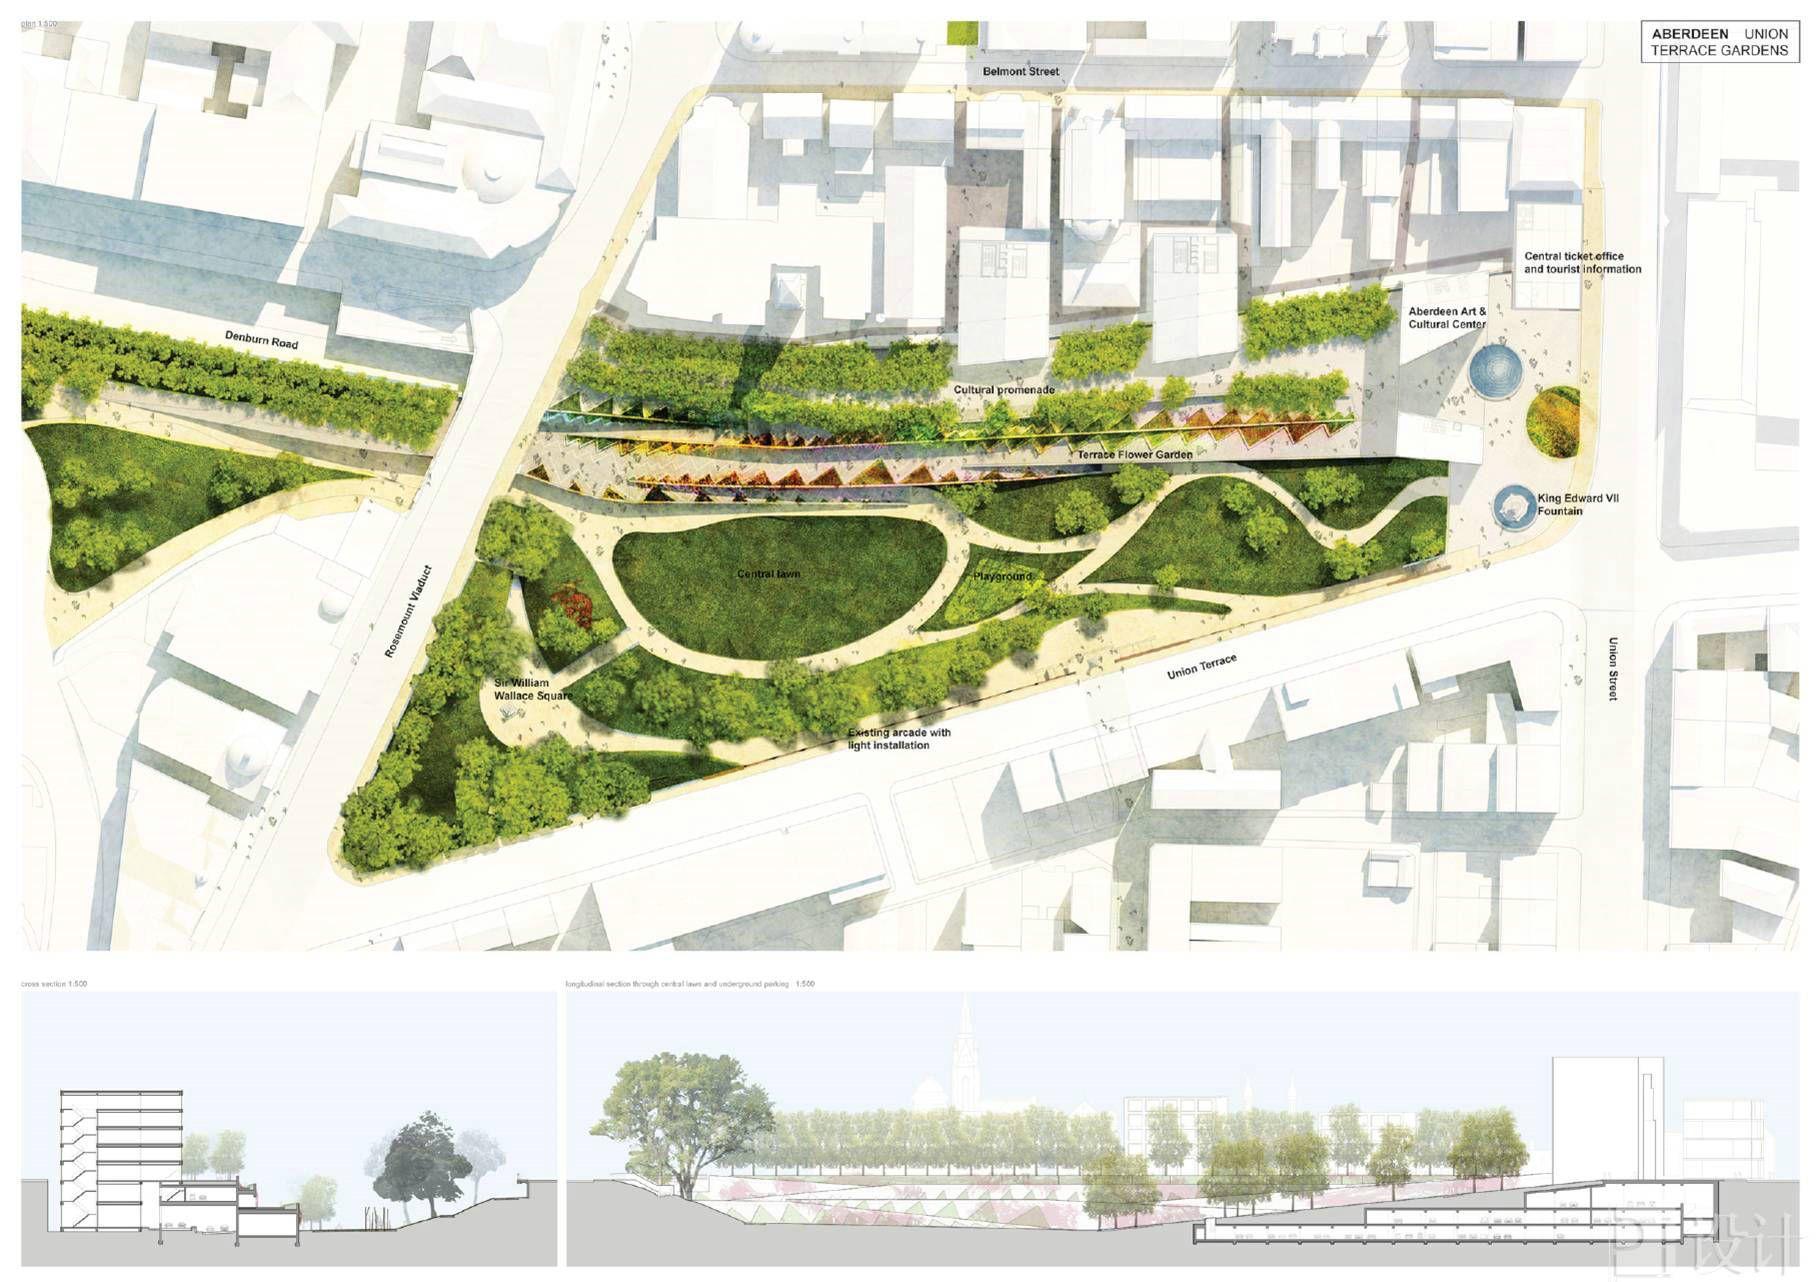 Top 100 Amazing Landscape Layout Ideas V 2 Urban Design Plan Landscape Design Landscape Plan